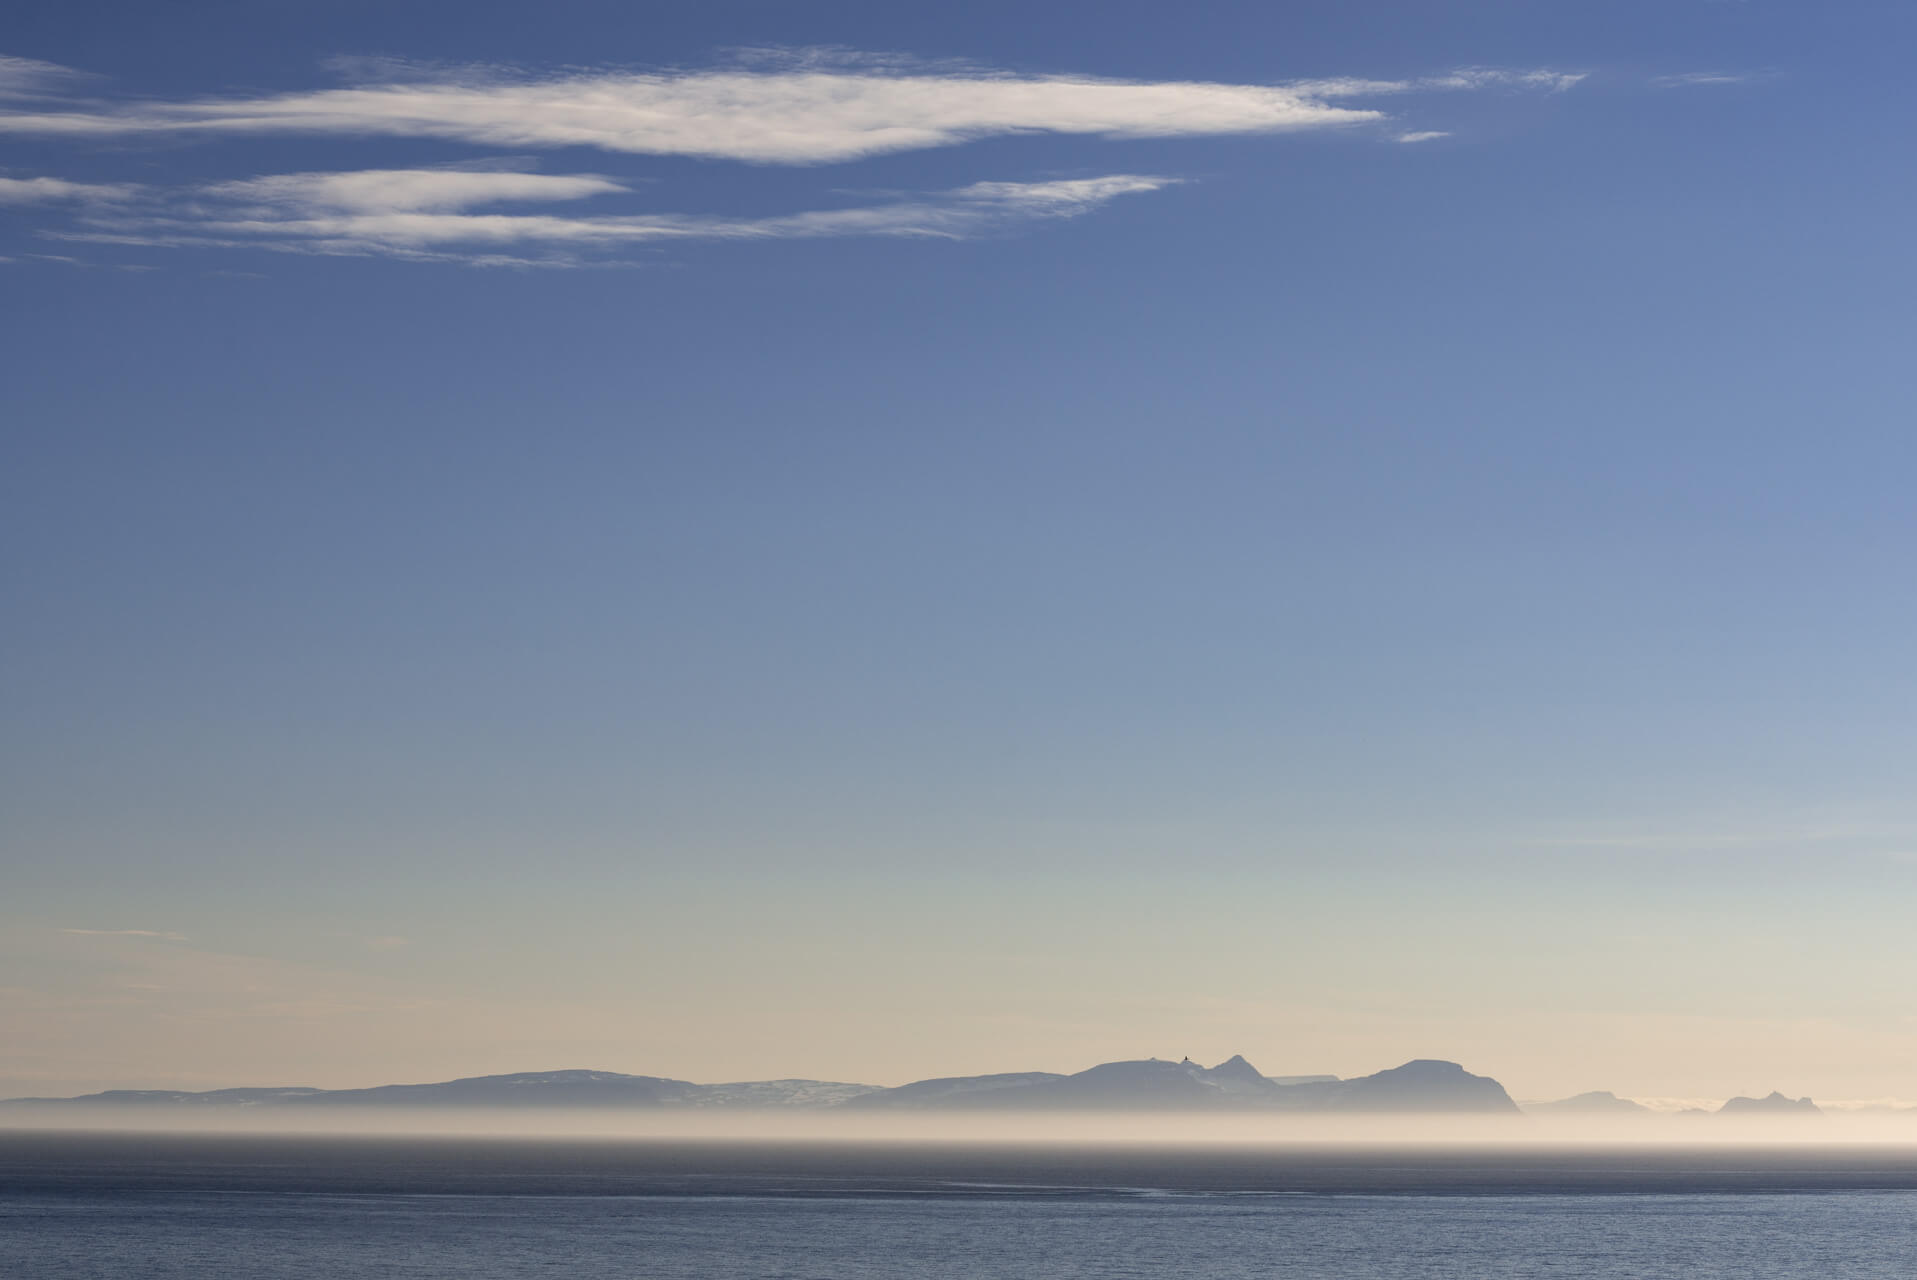 Island Mai 2013; Fotograf Steffen Lohse